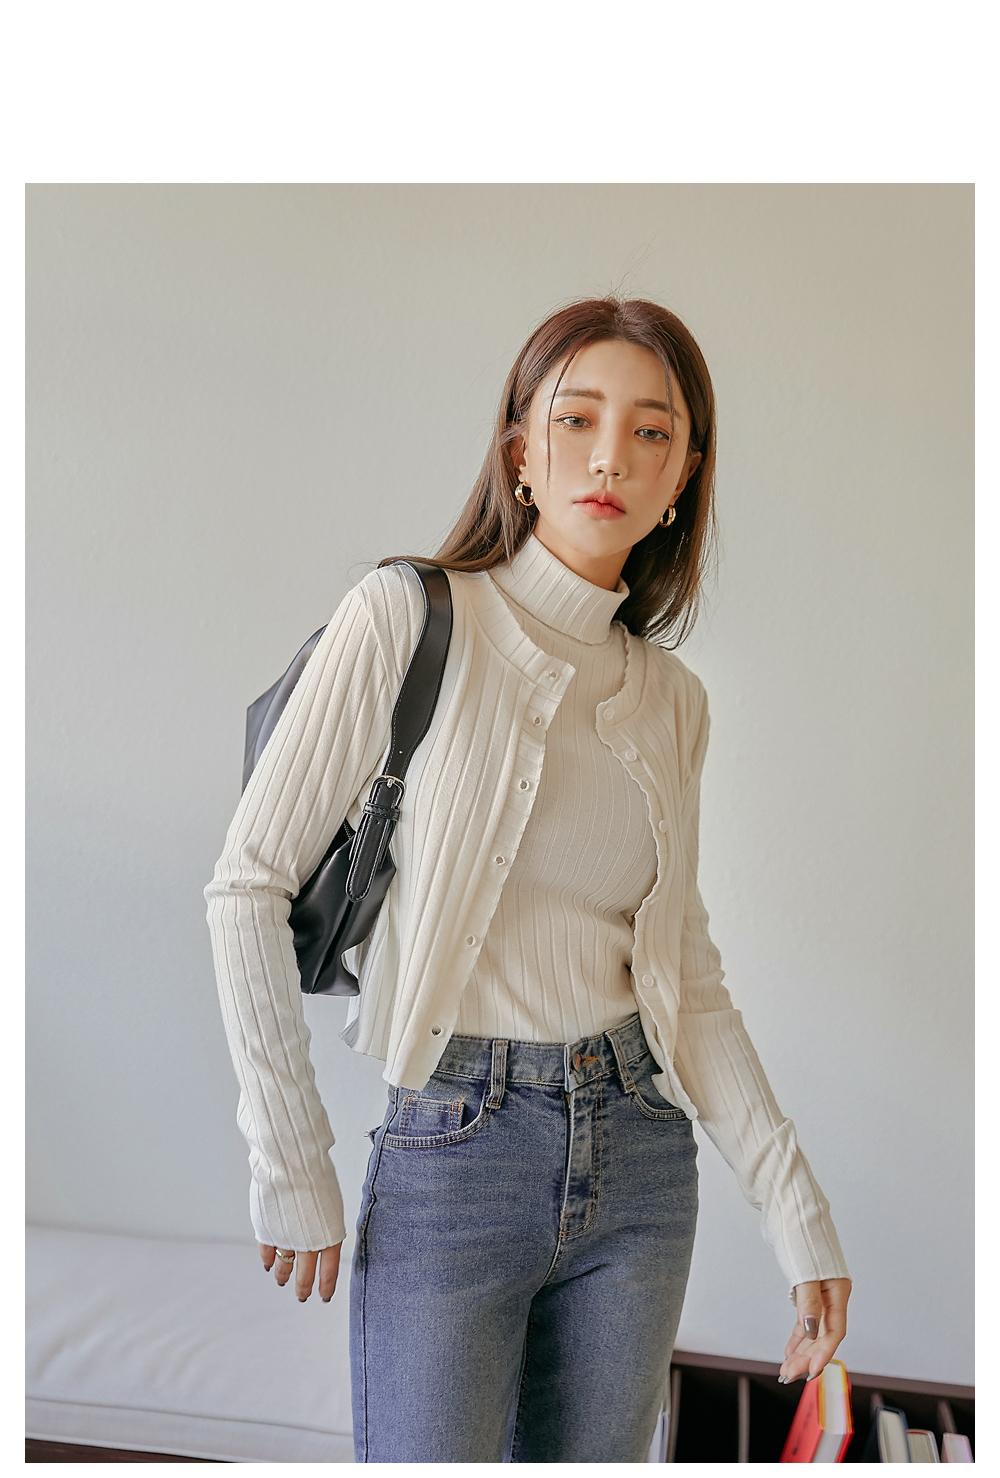 dress model image-S1L46